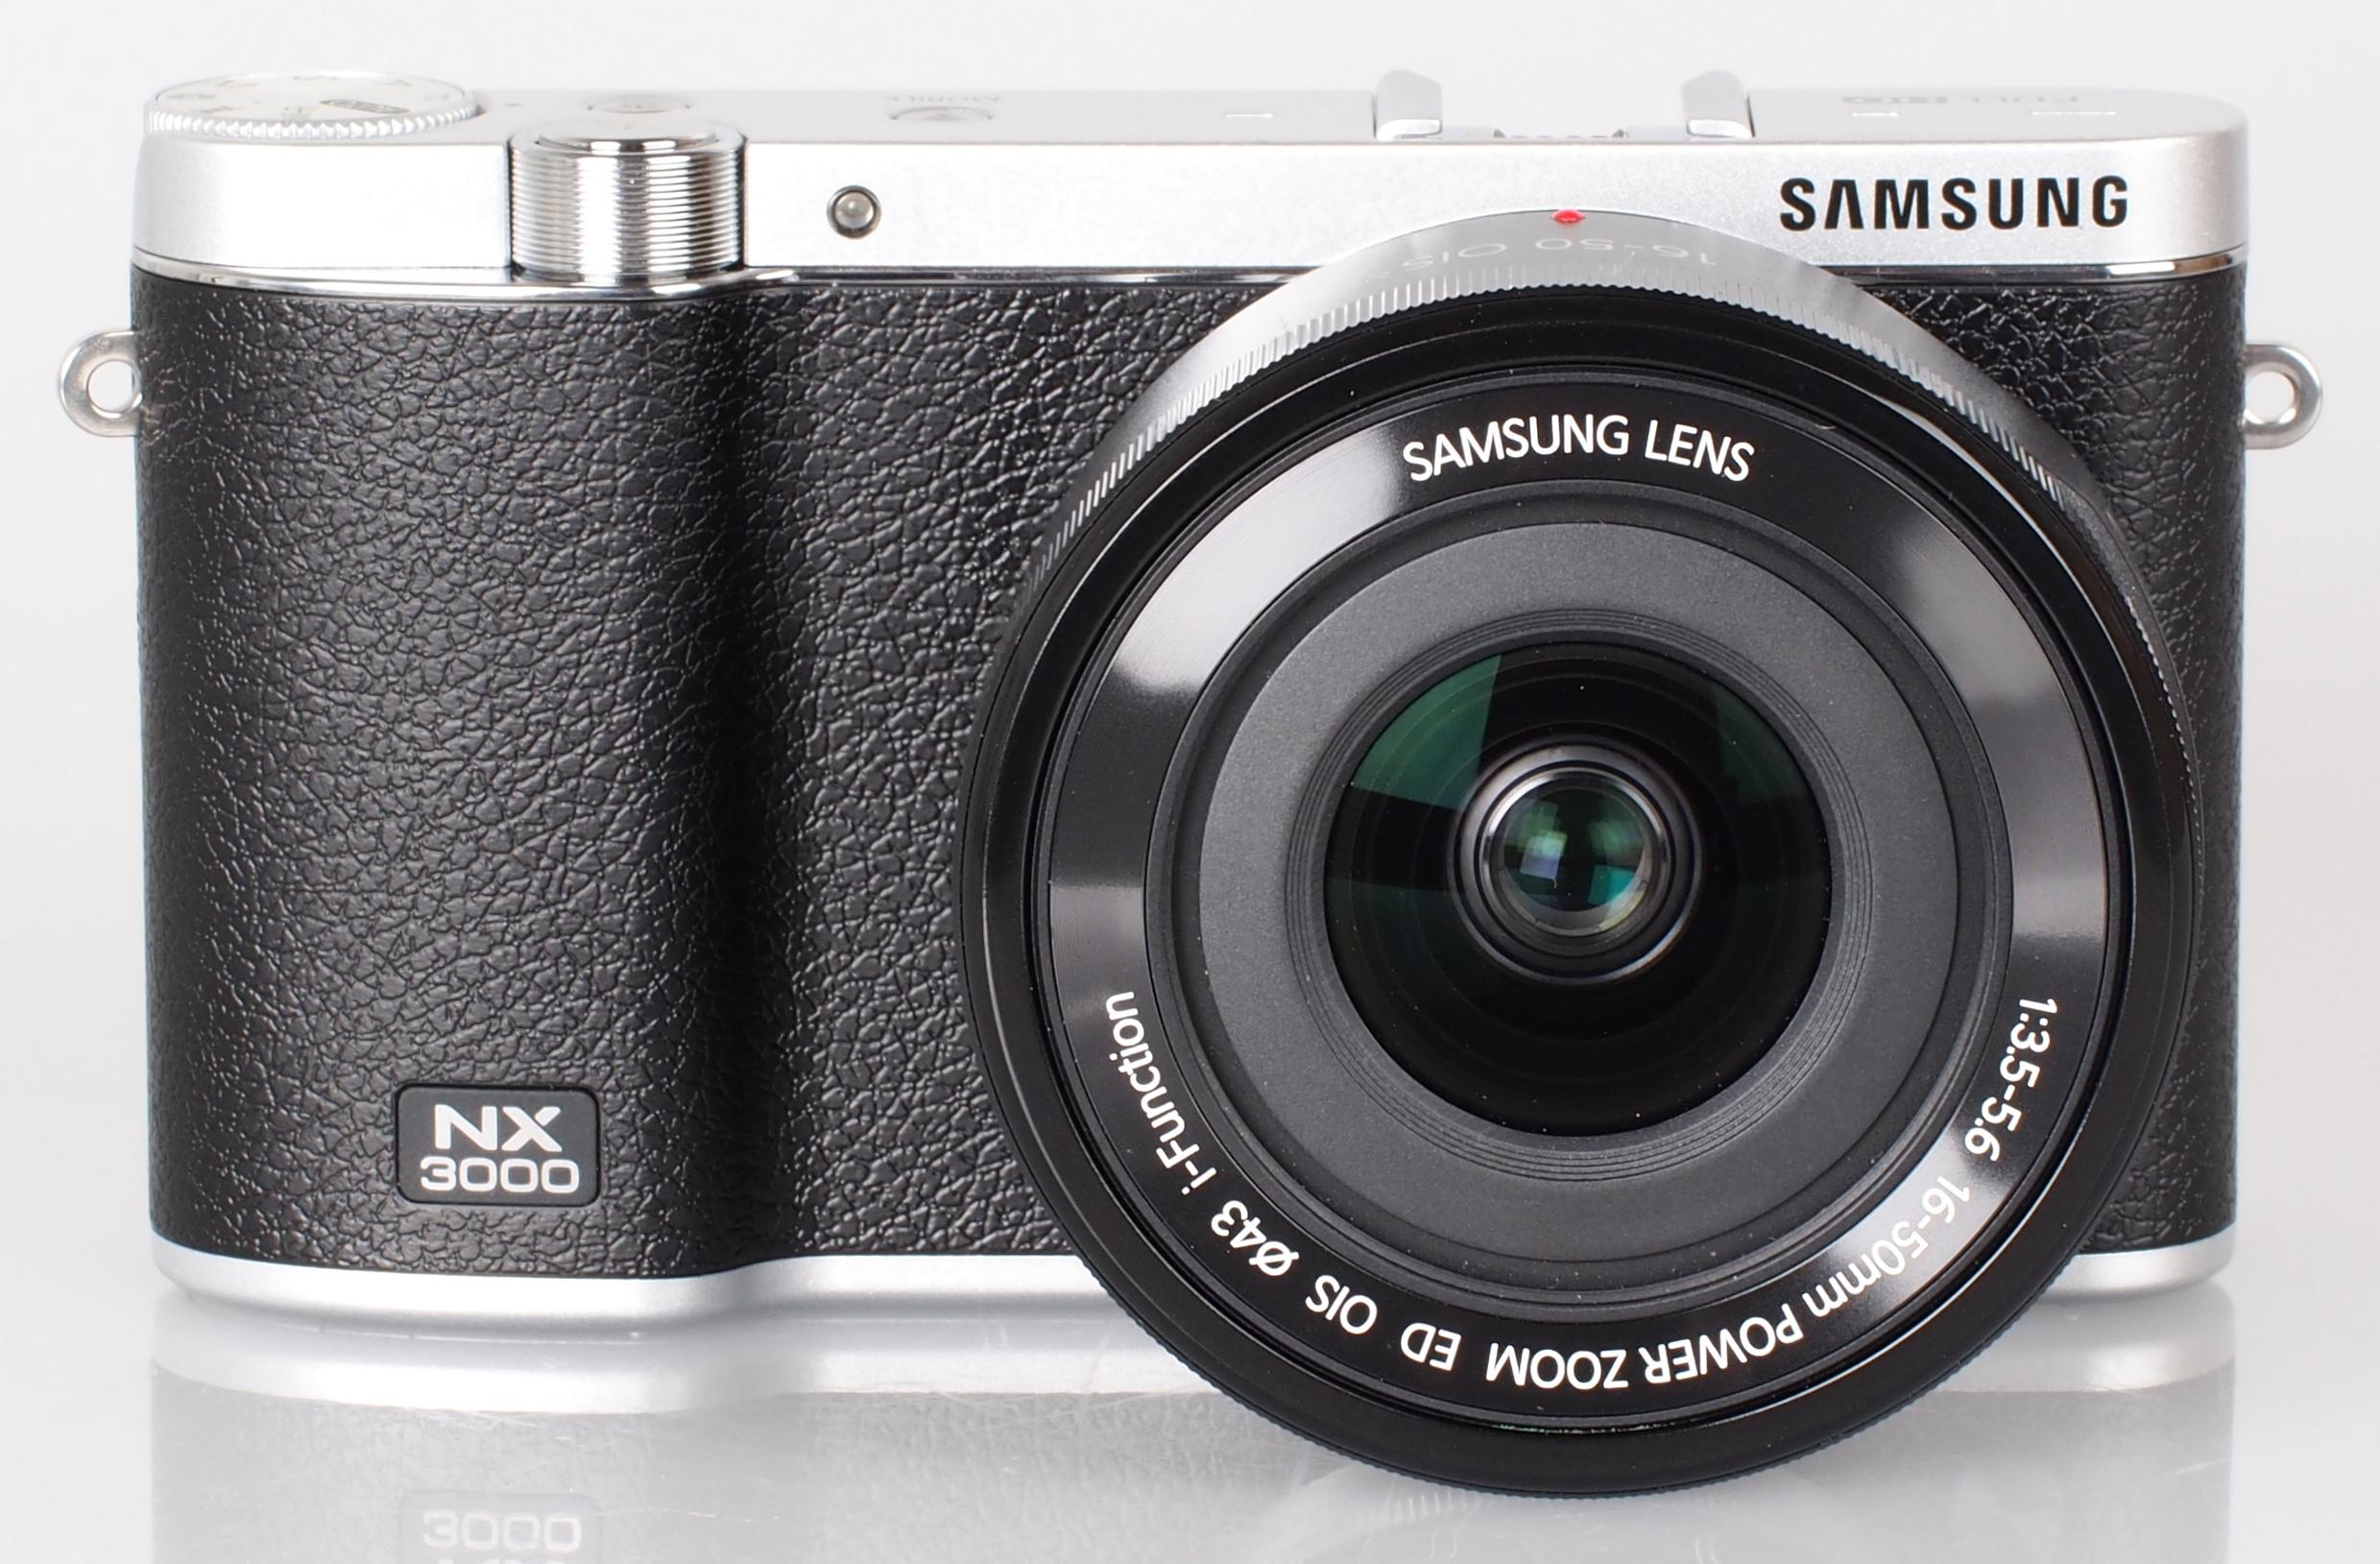 Samsung nx3000 camera user guide manual pdf   manualzz.